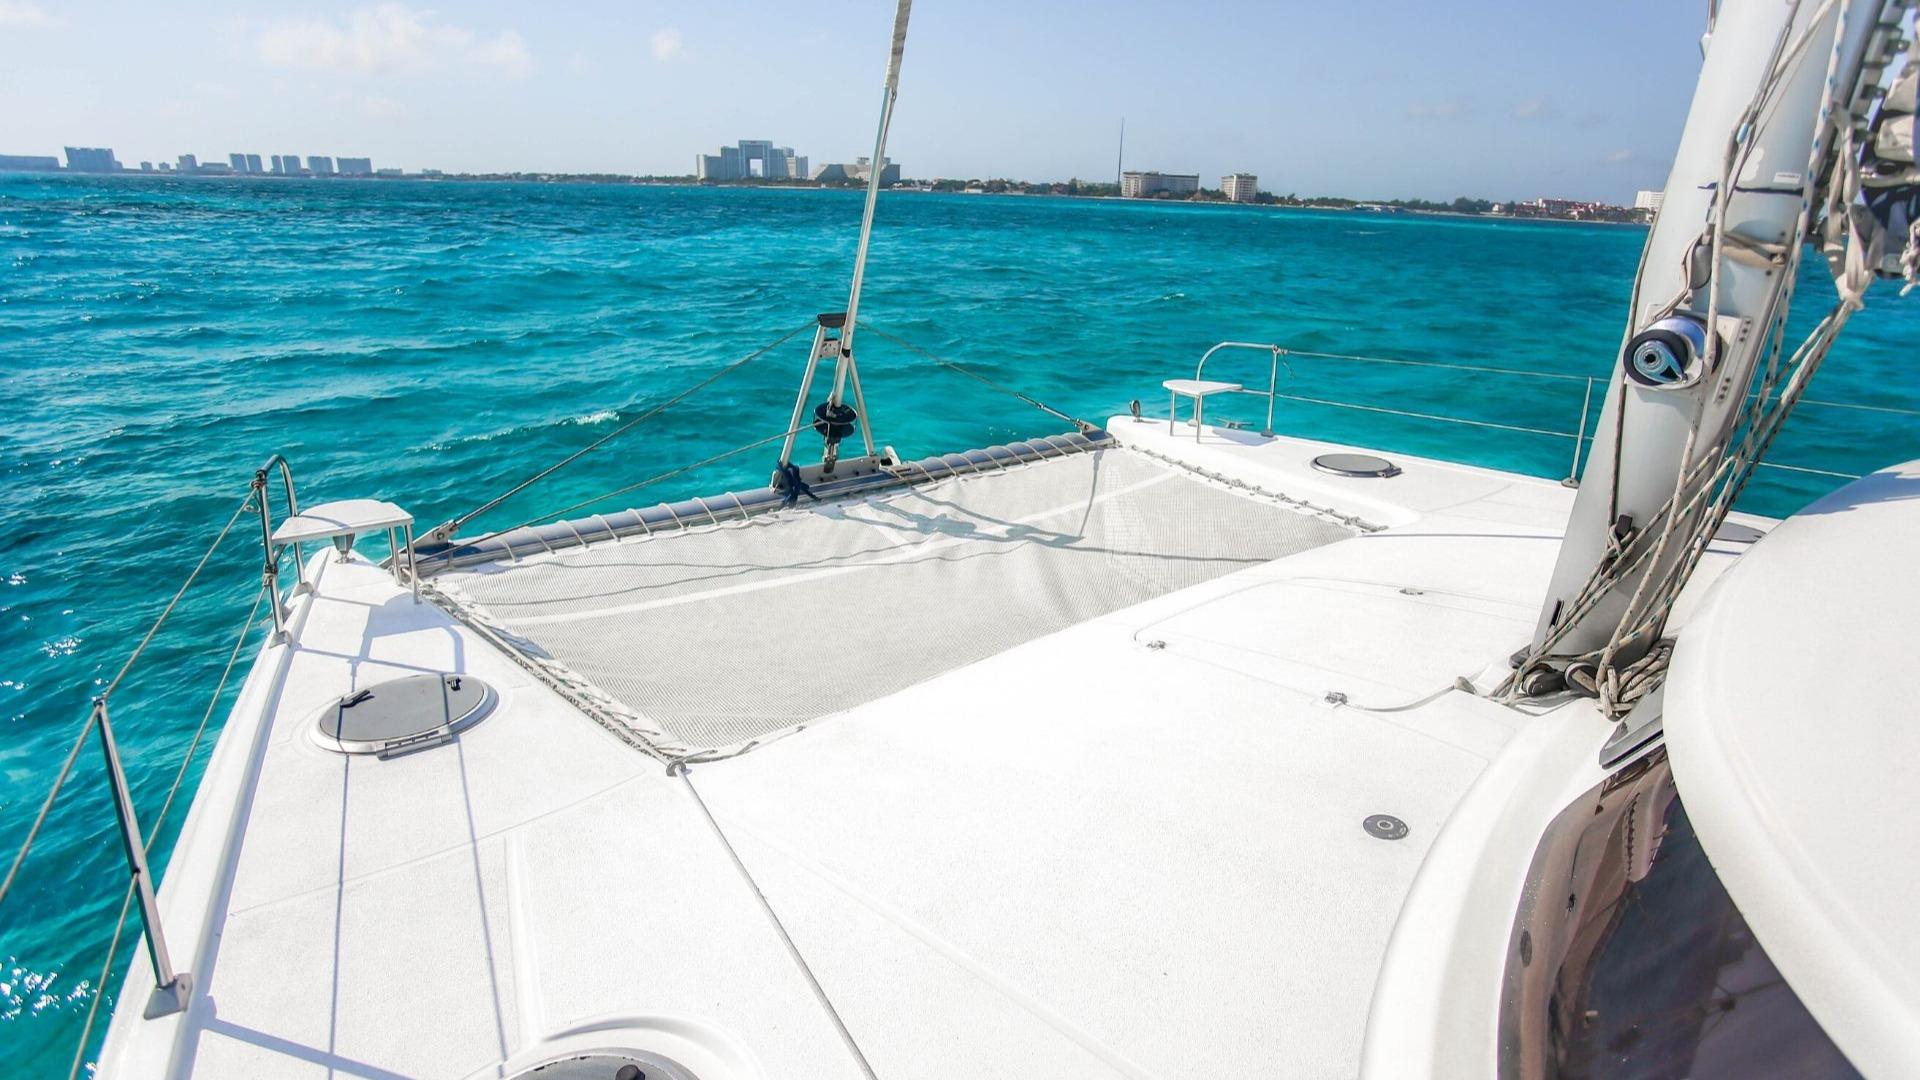 Lady Caroline - Isla Mujeres Catamaran Tour - Cancun Sailing